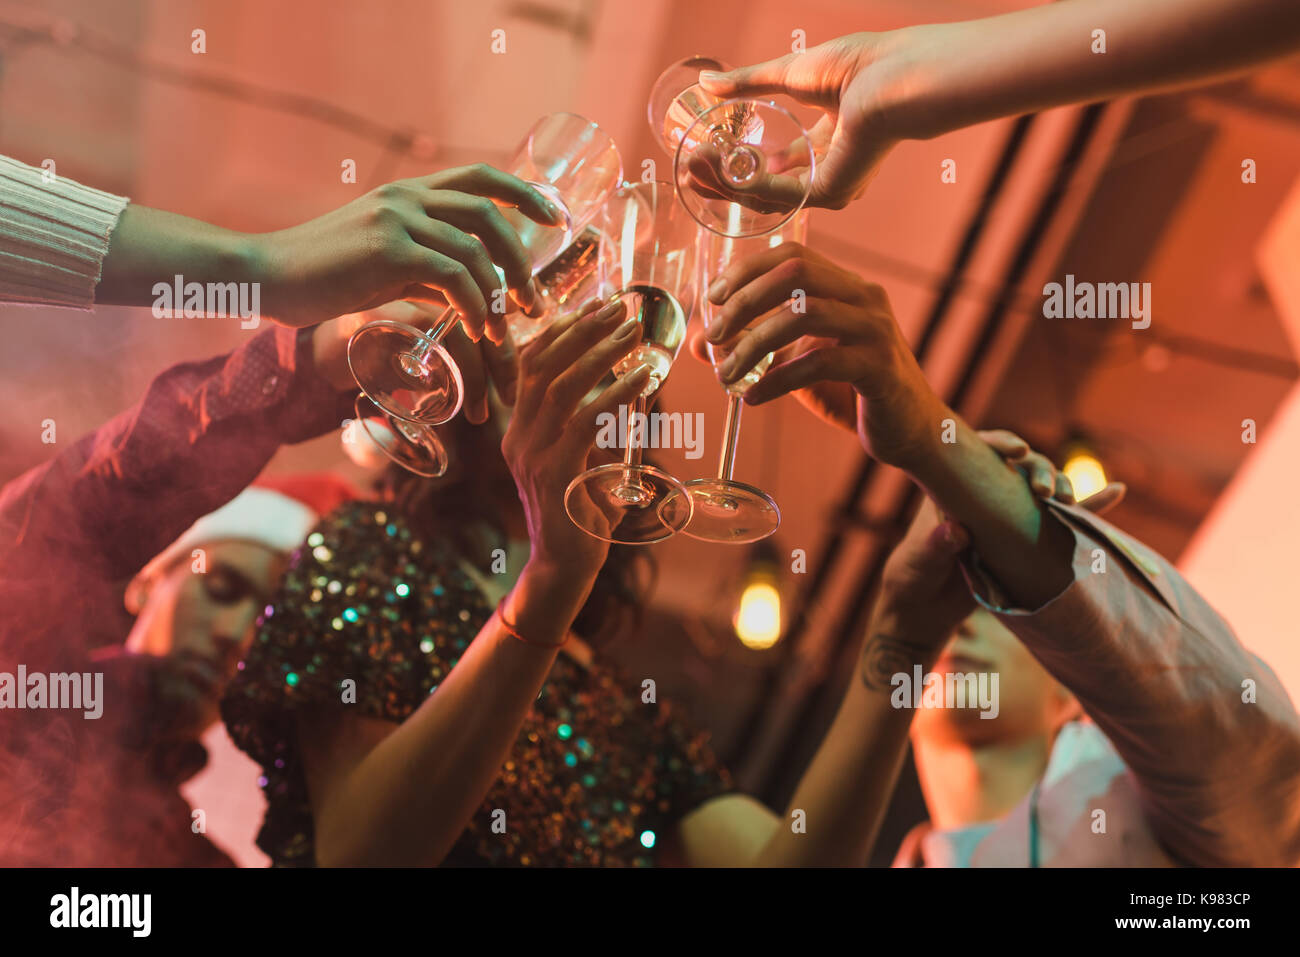 Amici tintinnanti bicchieri di champagne Immagini Stock